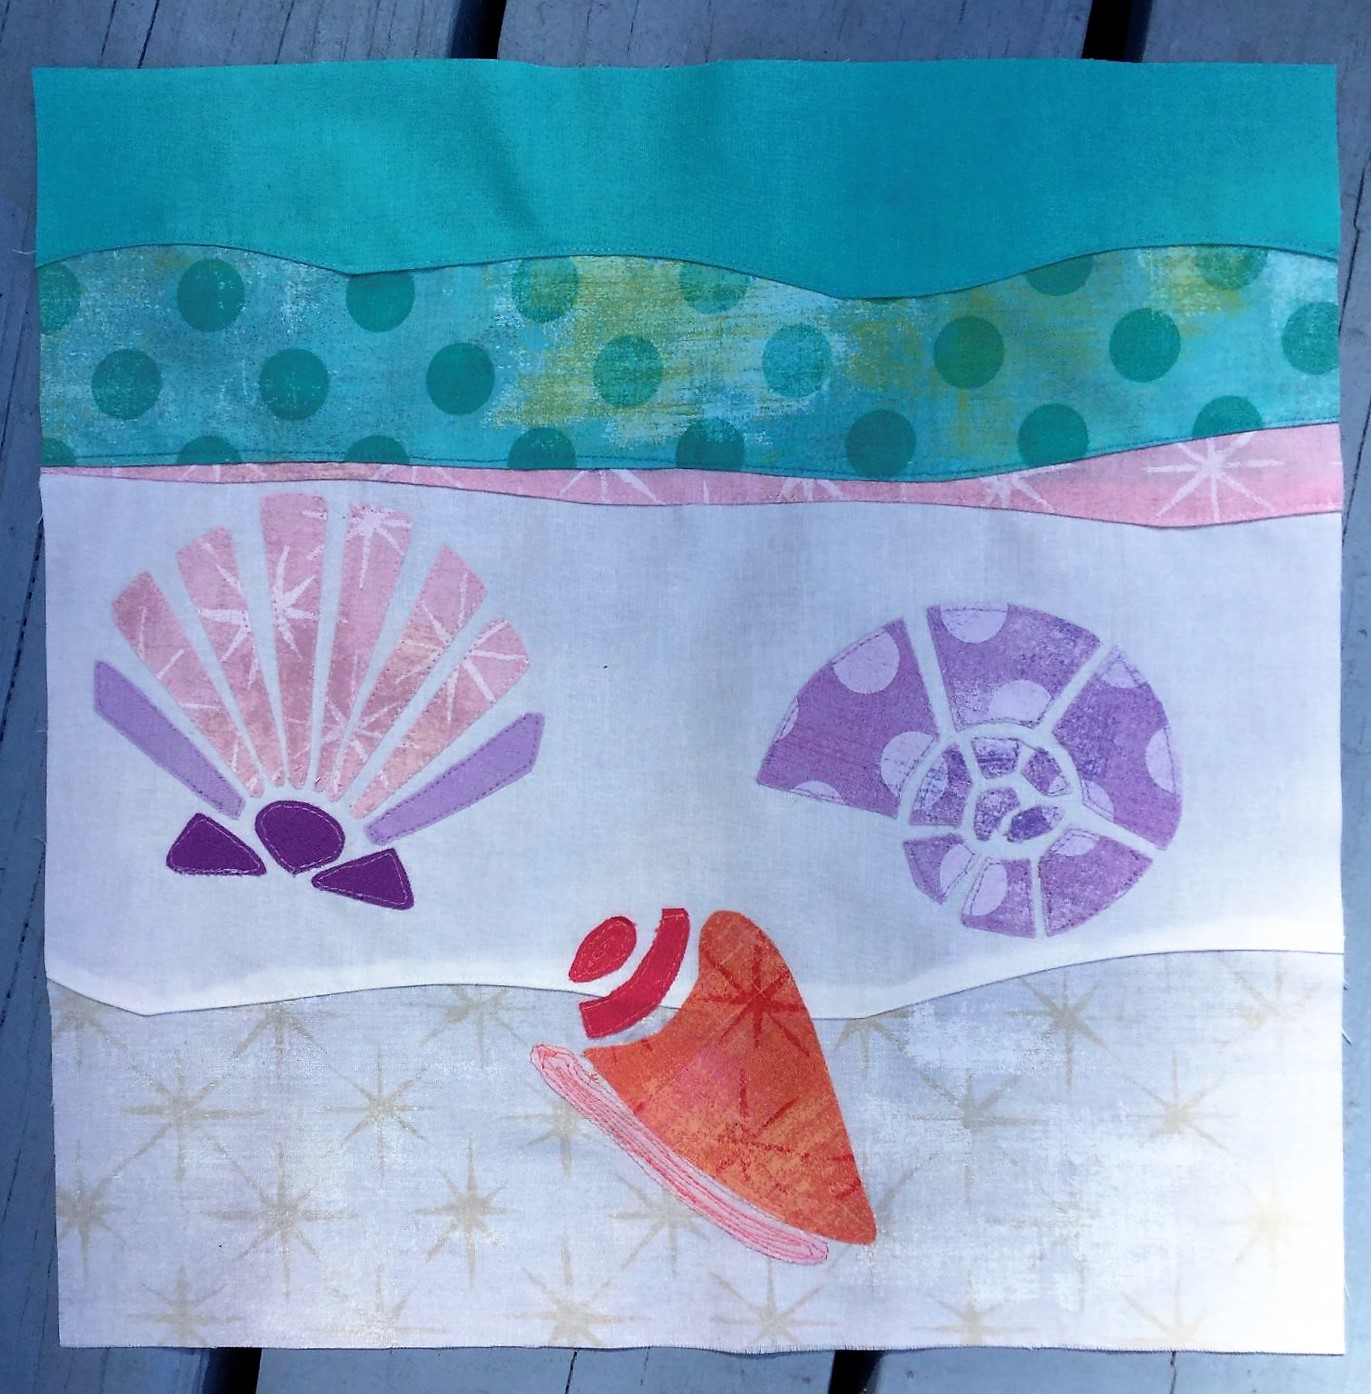 Sea Sews Seashells by the Seashore by Becca Fenstermaker